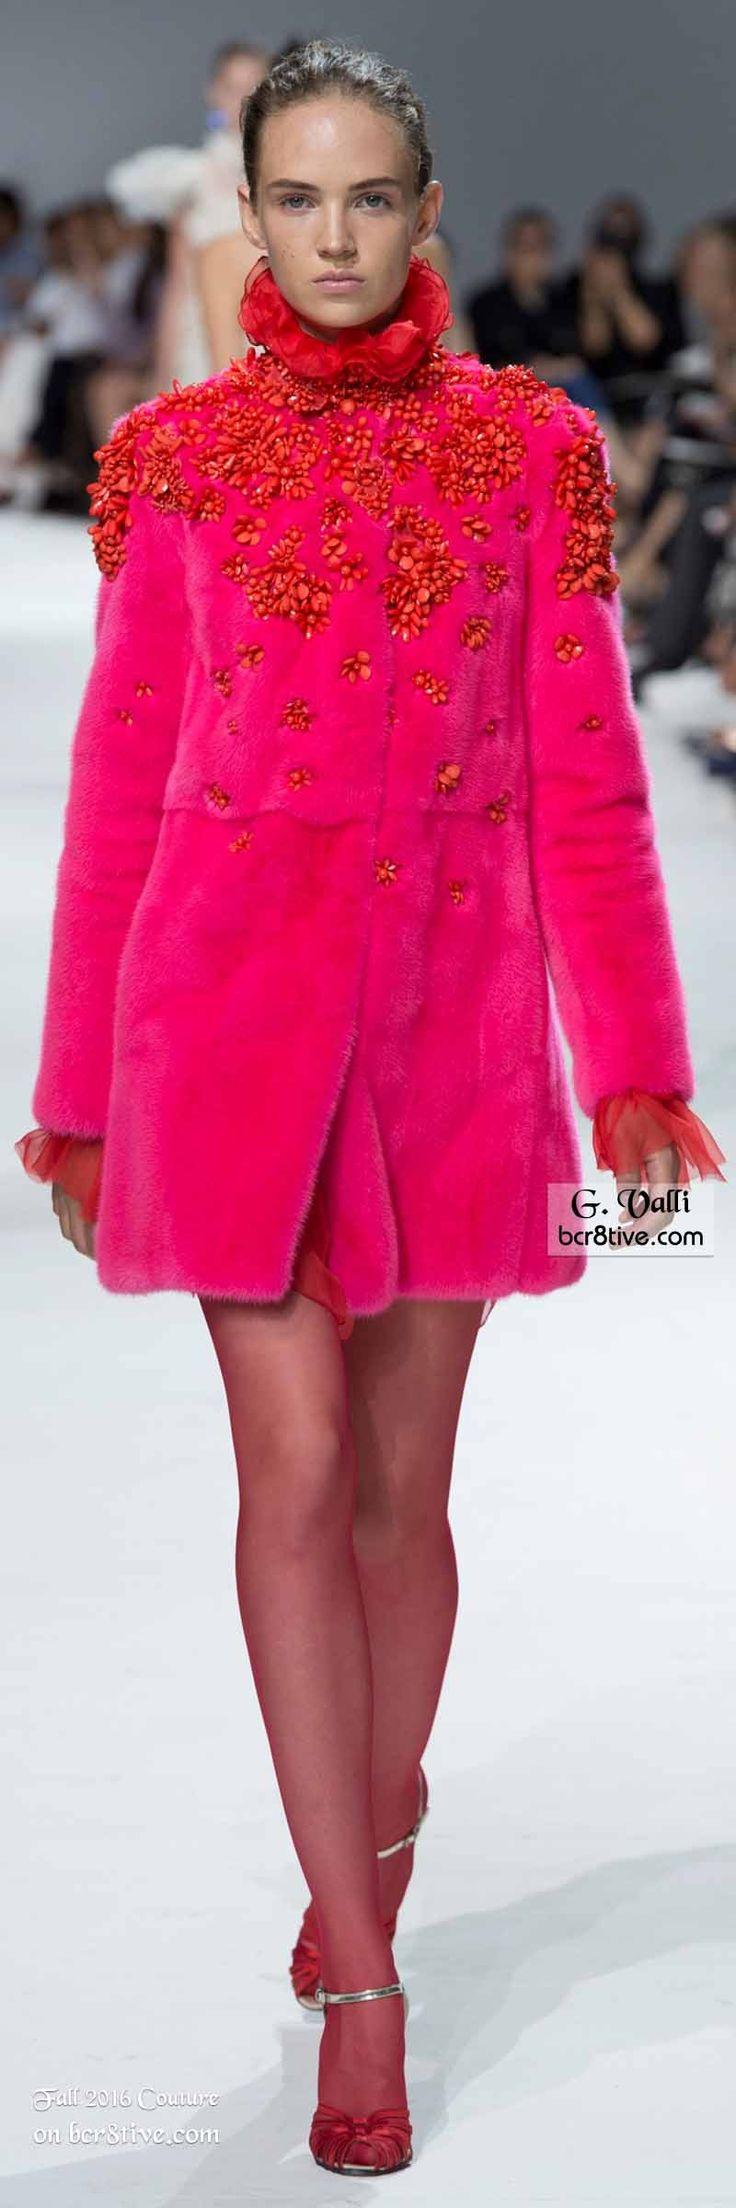 Giambattista Valli - The Best Fall 2016 Haute Couture Fashion